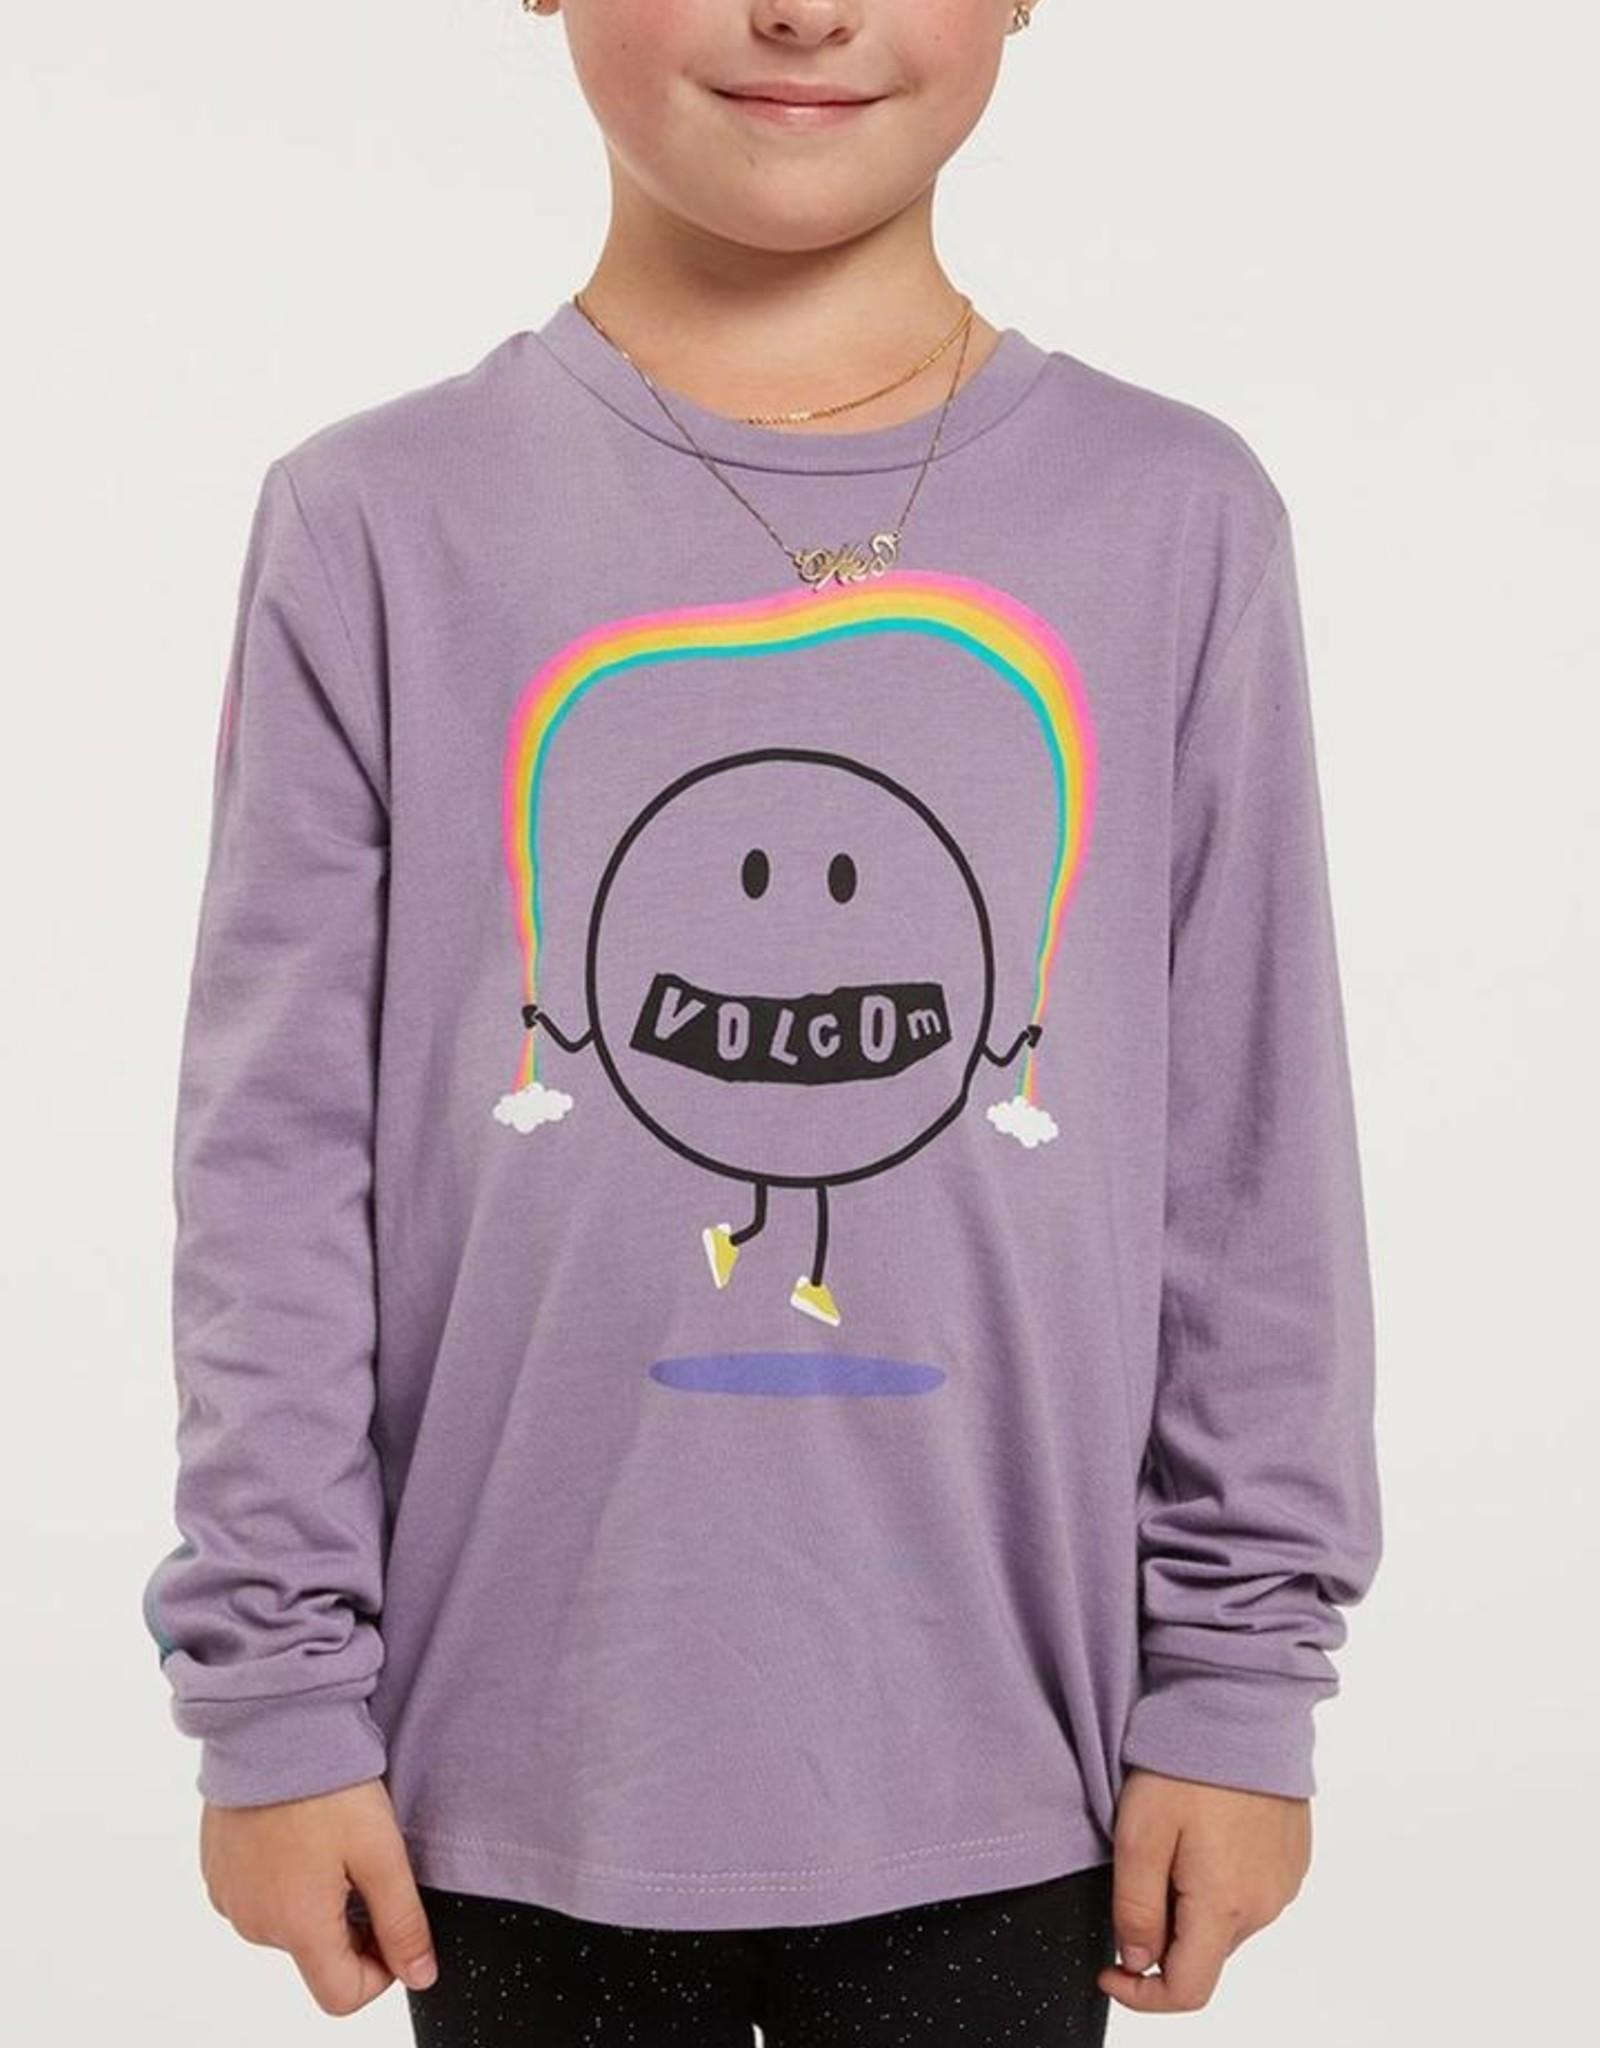 Volcom FA20 Girl's Made from Stoke - Long Sleeve Purple